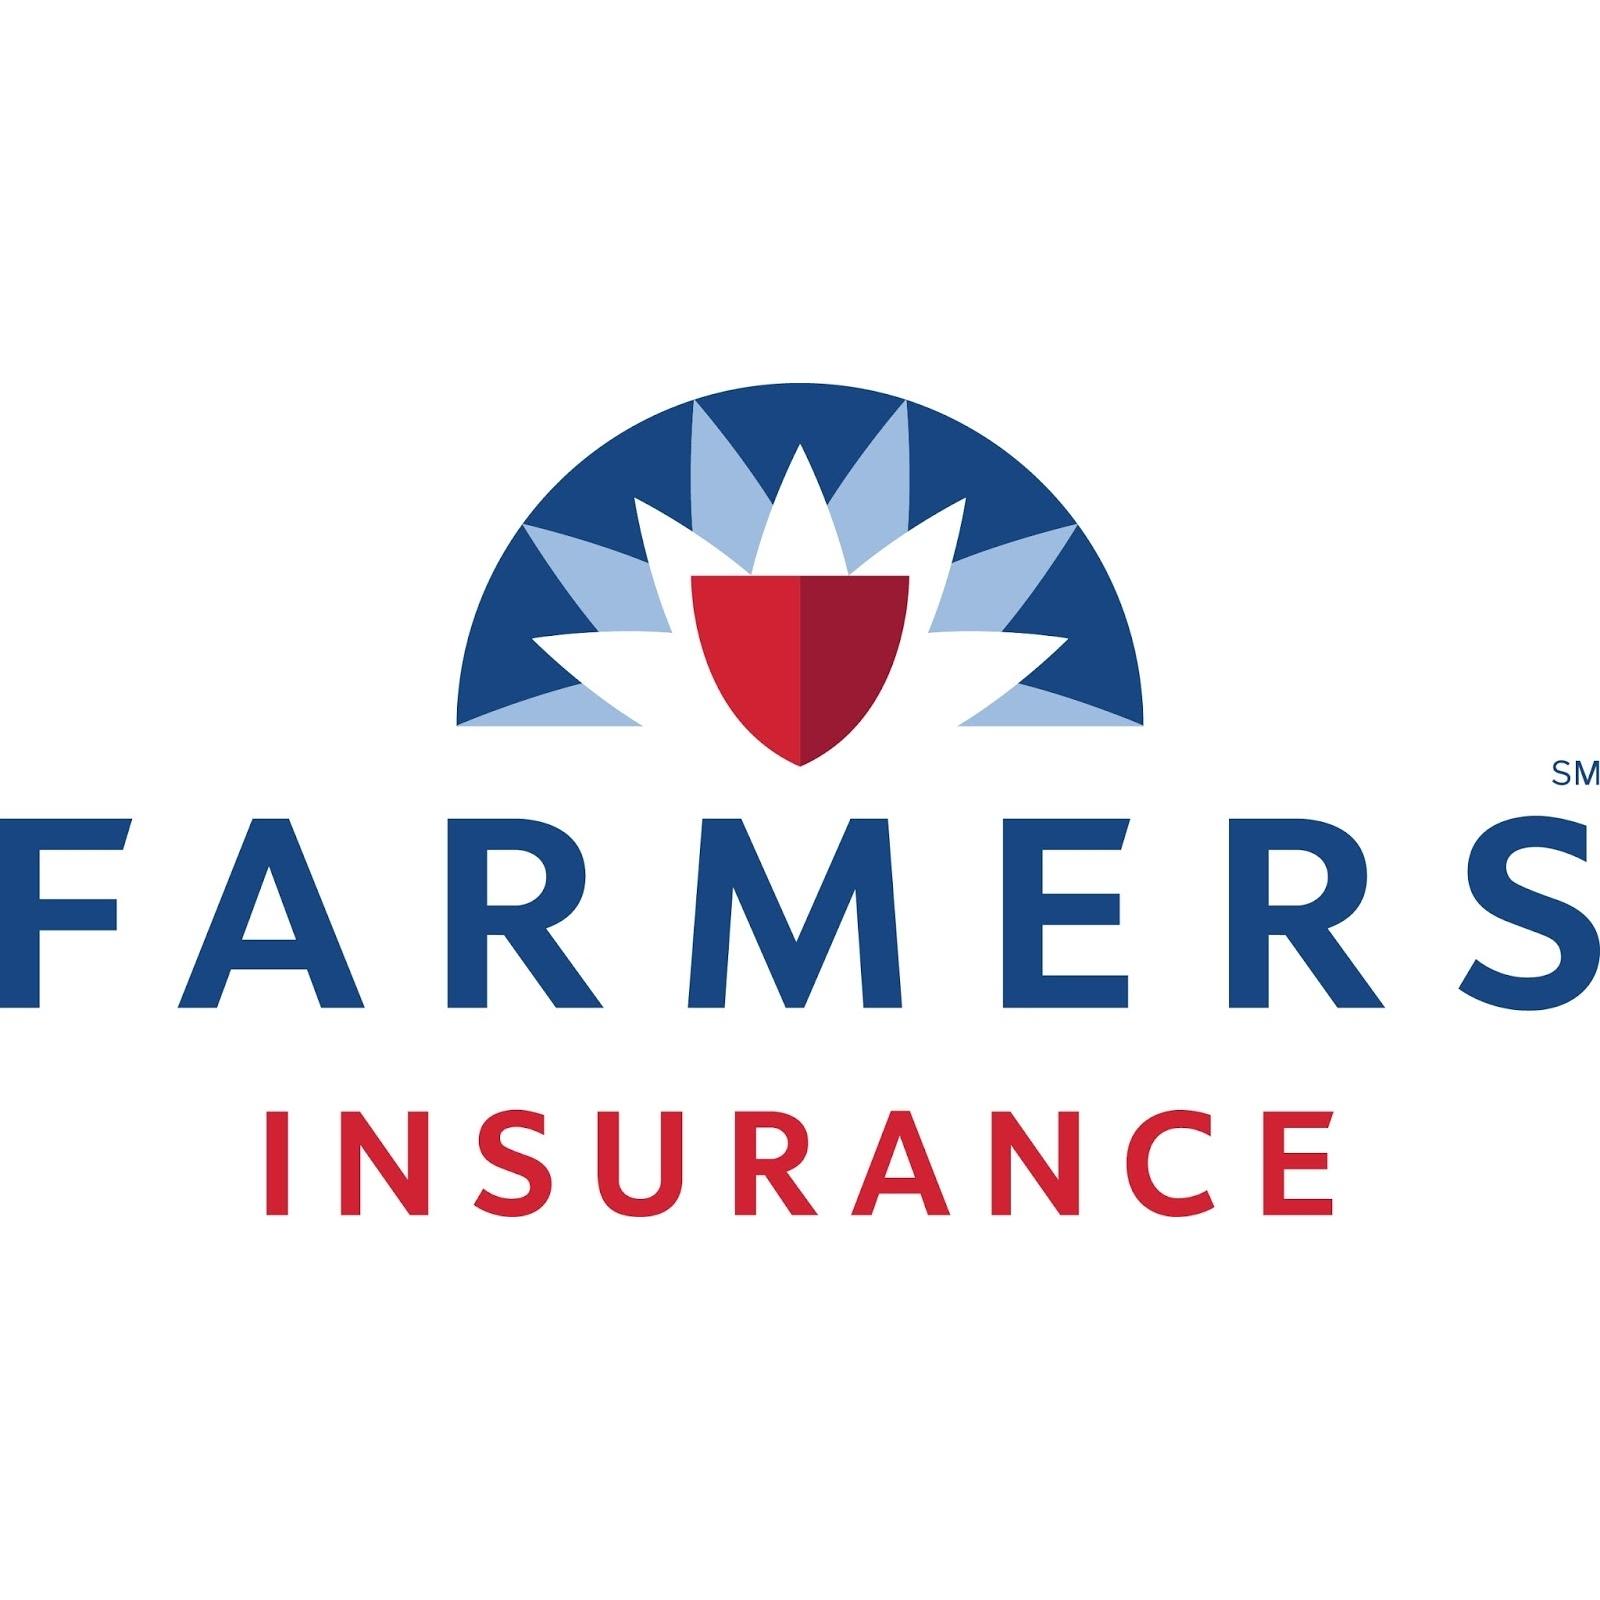 Carol Flowers Farmers Insurance image 2